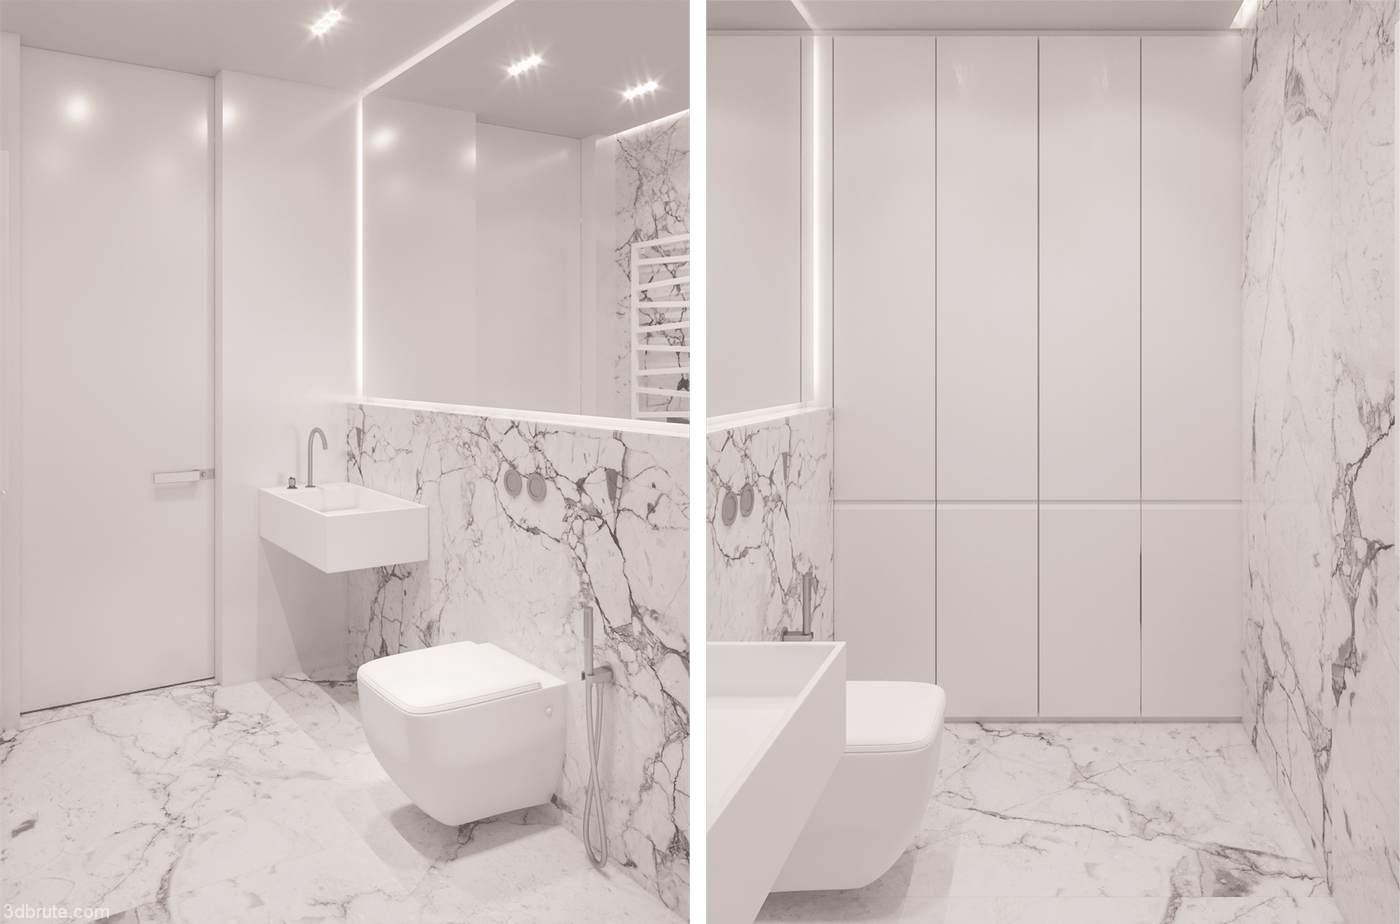 90 square meters design - Download -3d Models Free -3dbrute